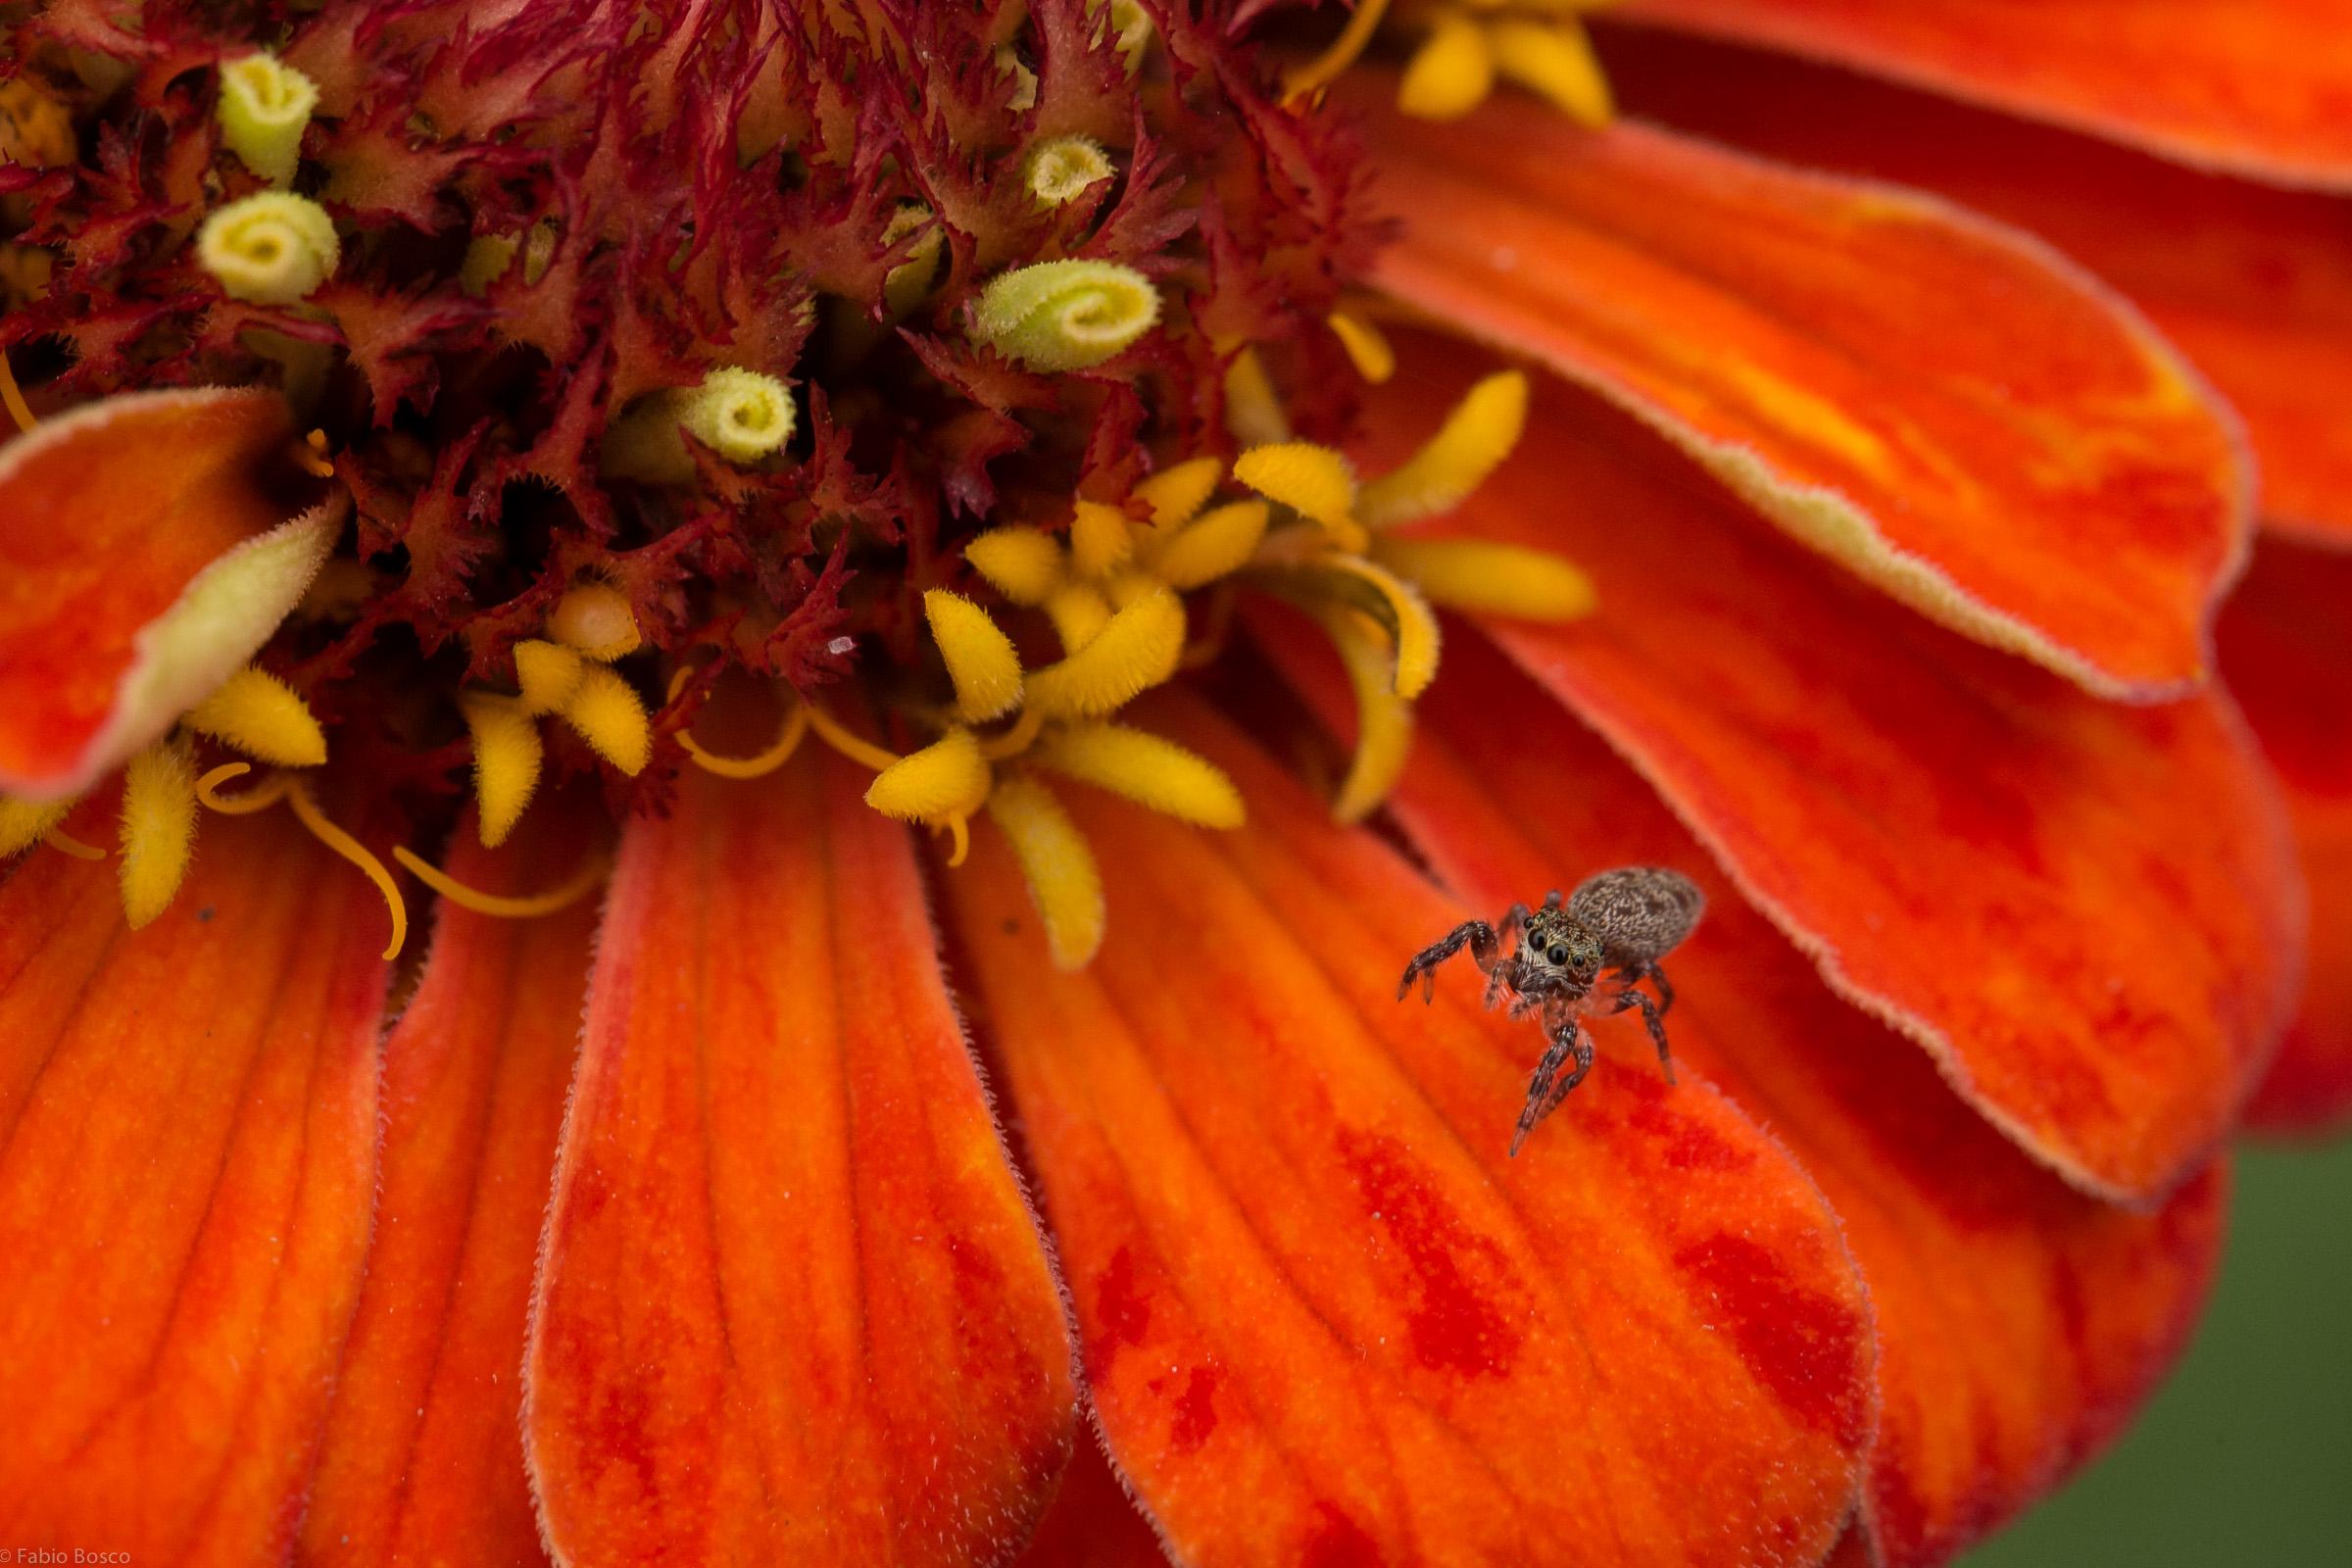 FabioBoscoPhotography_Little spider on the flower-098414.jpg